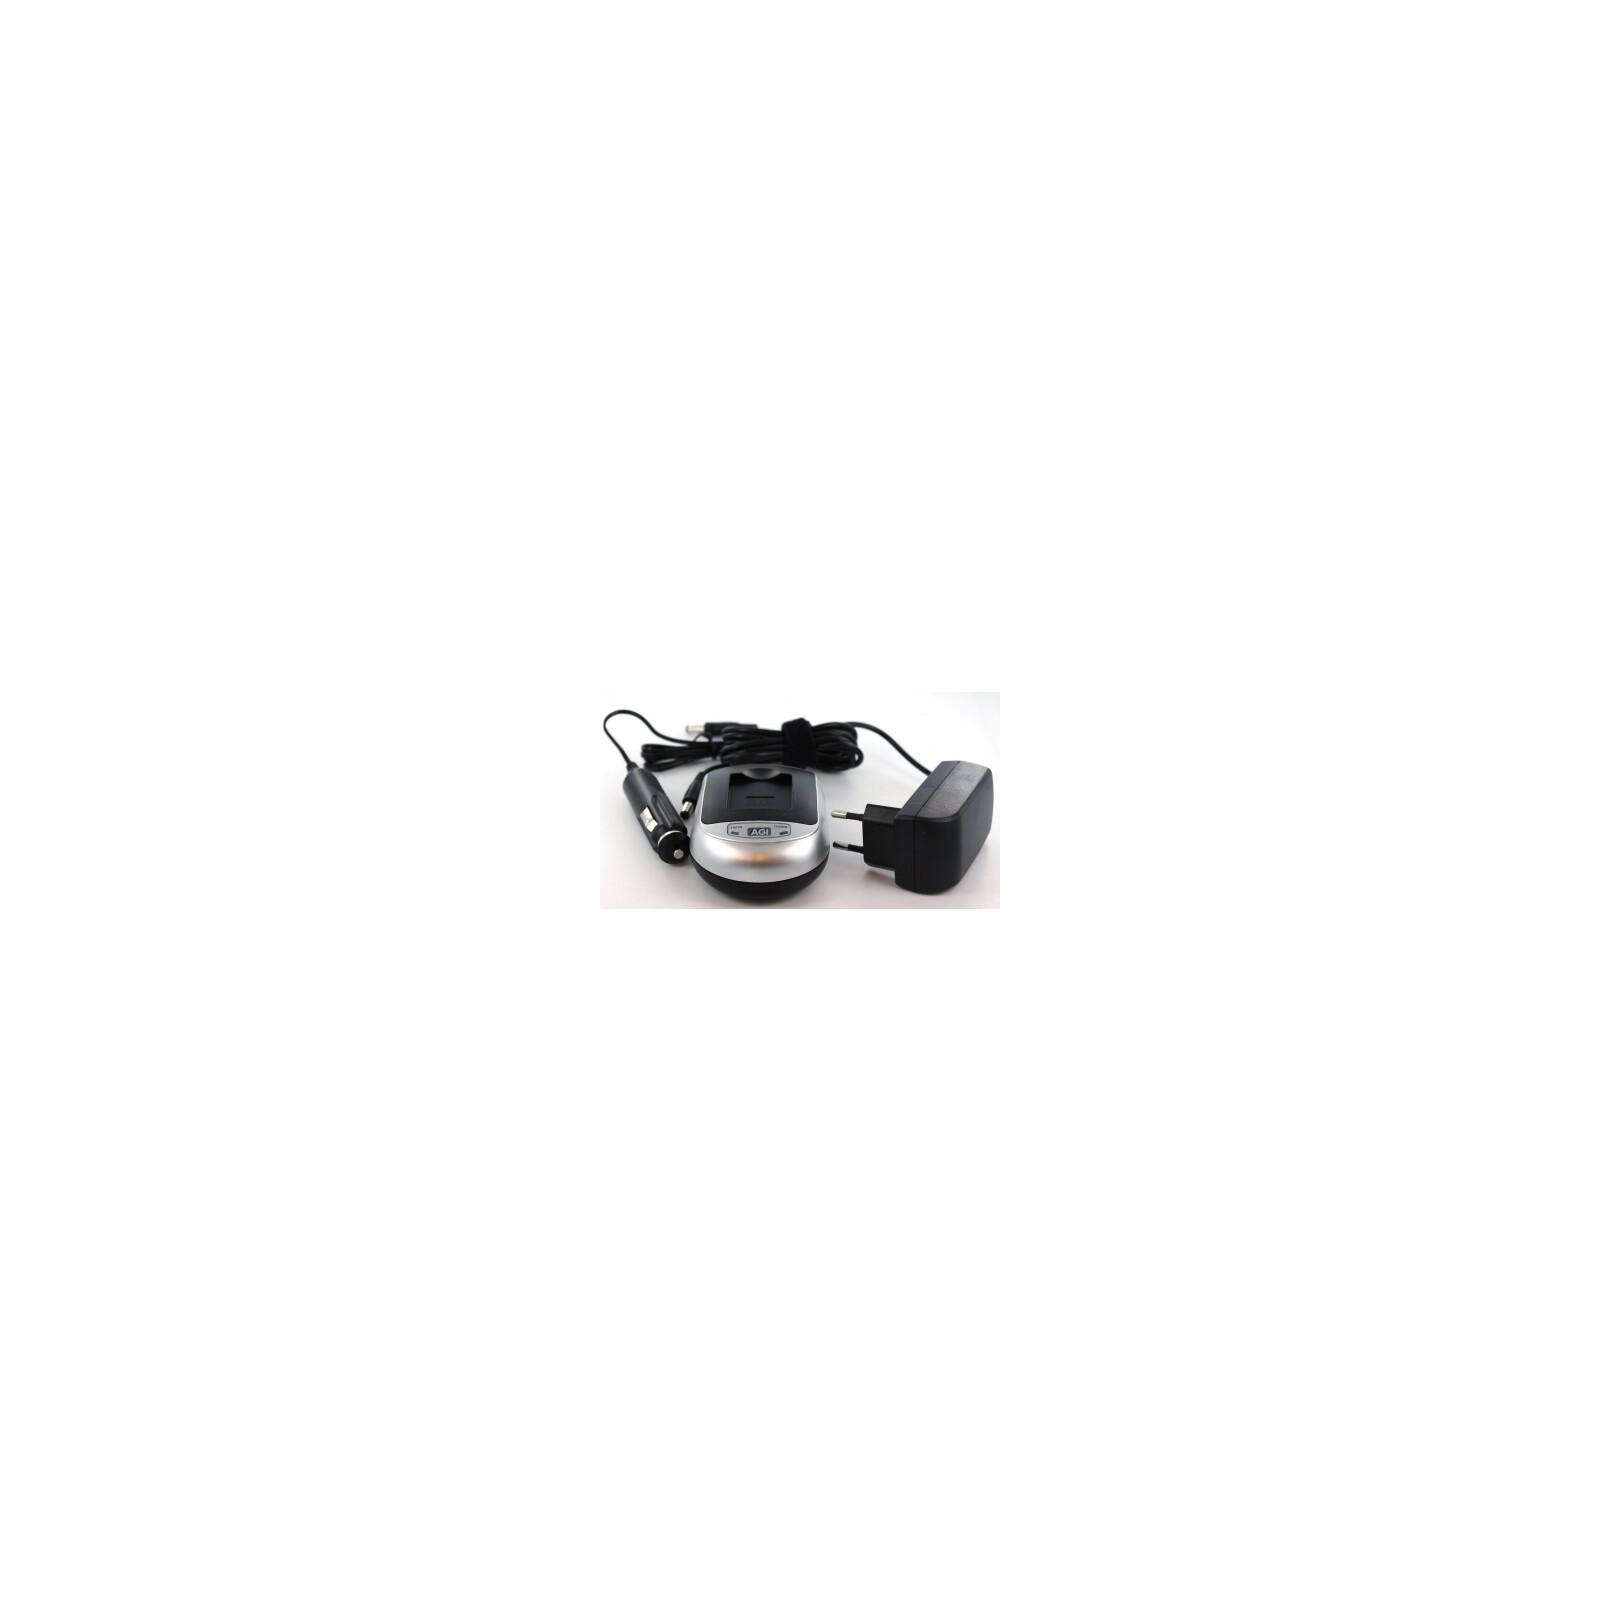 AGI 86286 Ladegerät Nikon Coolpix S2600